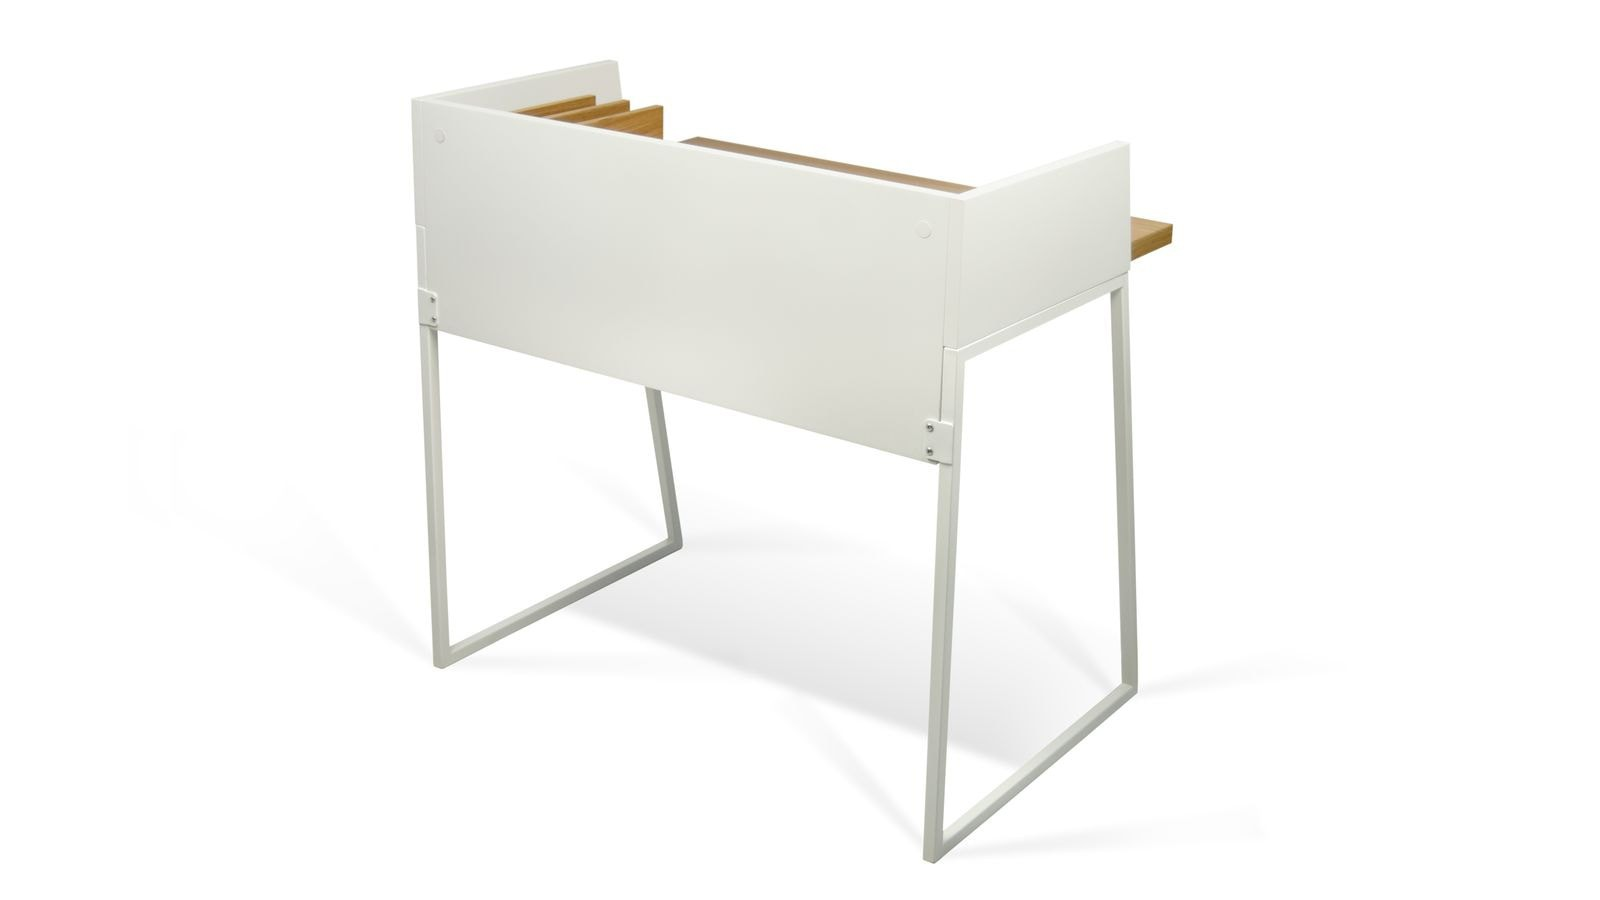 Bureau blanc et bois clair collection volga temahome homifab